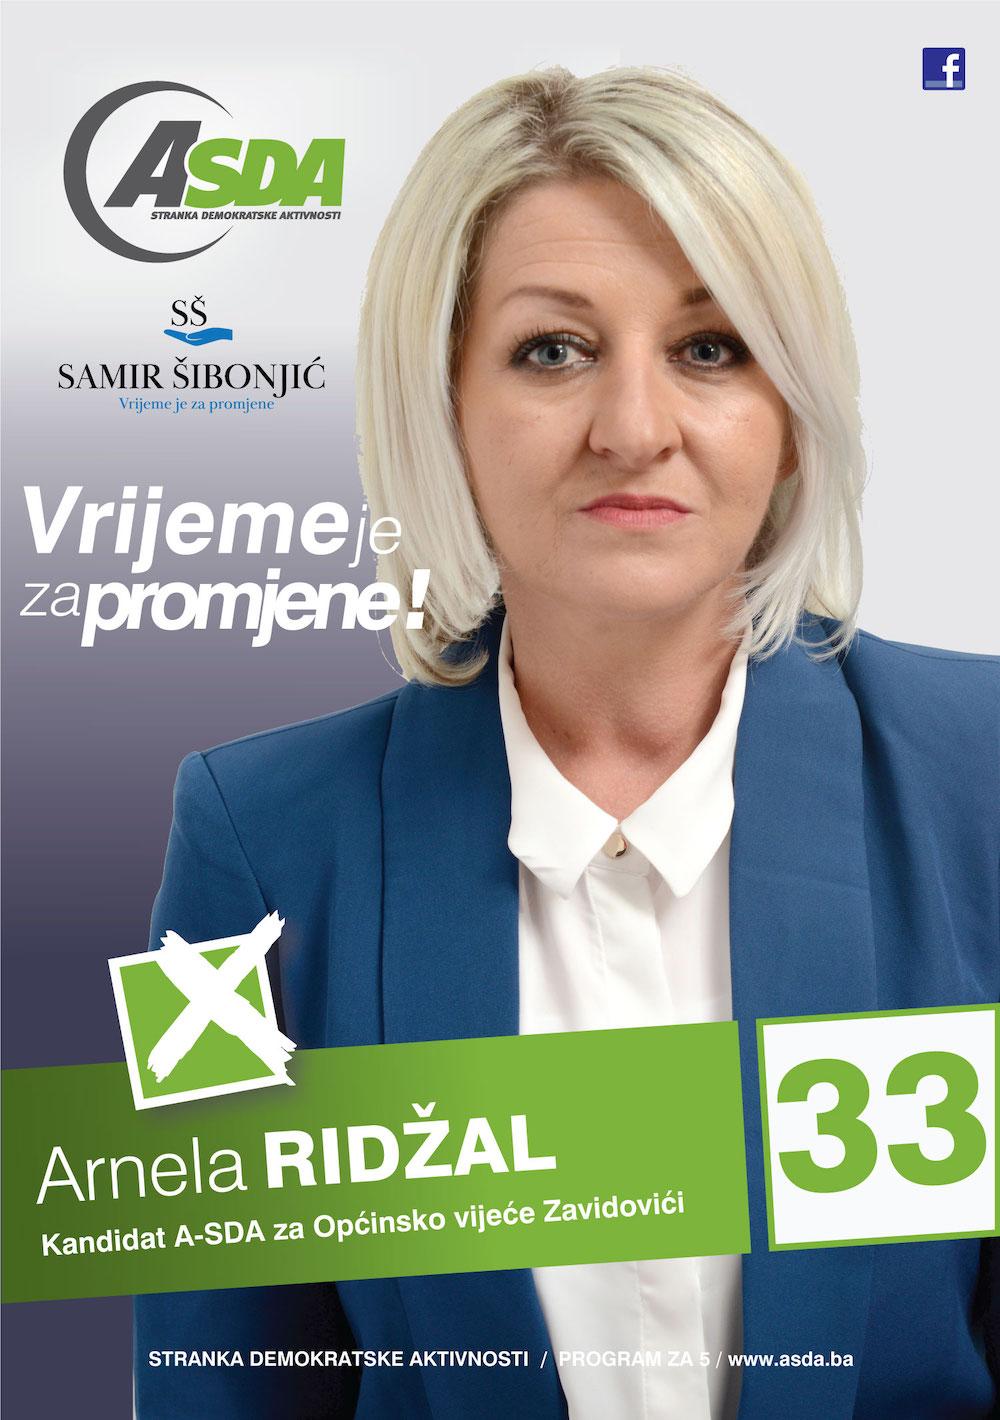 Arnela Ridžal